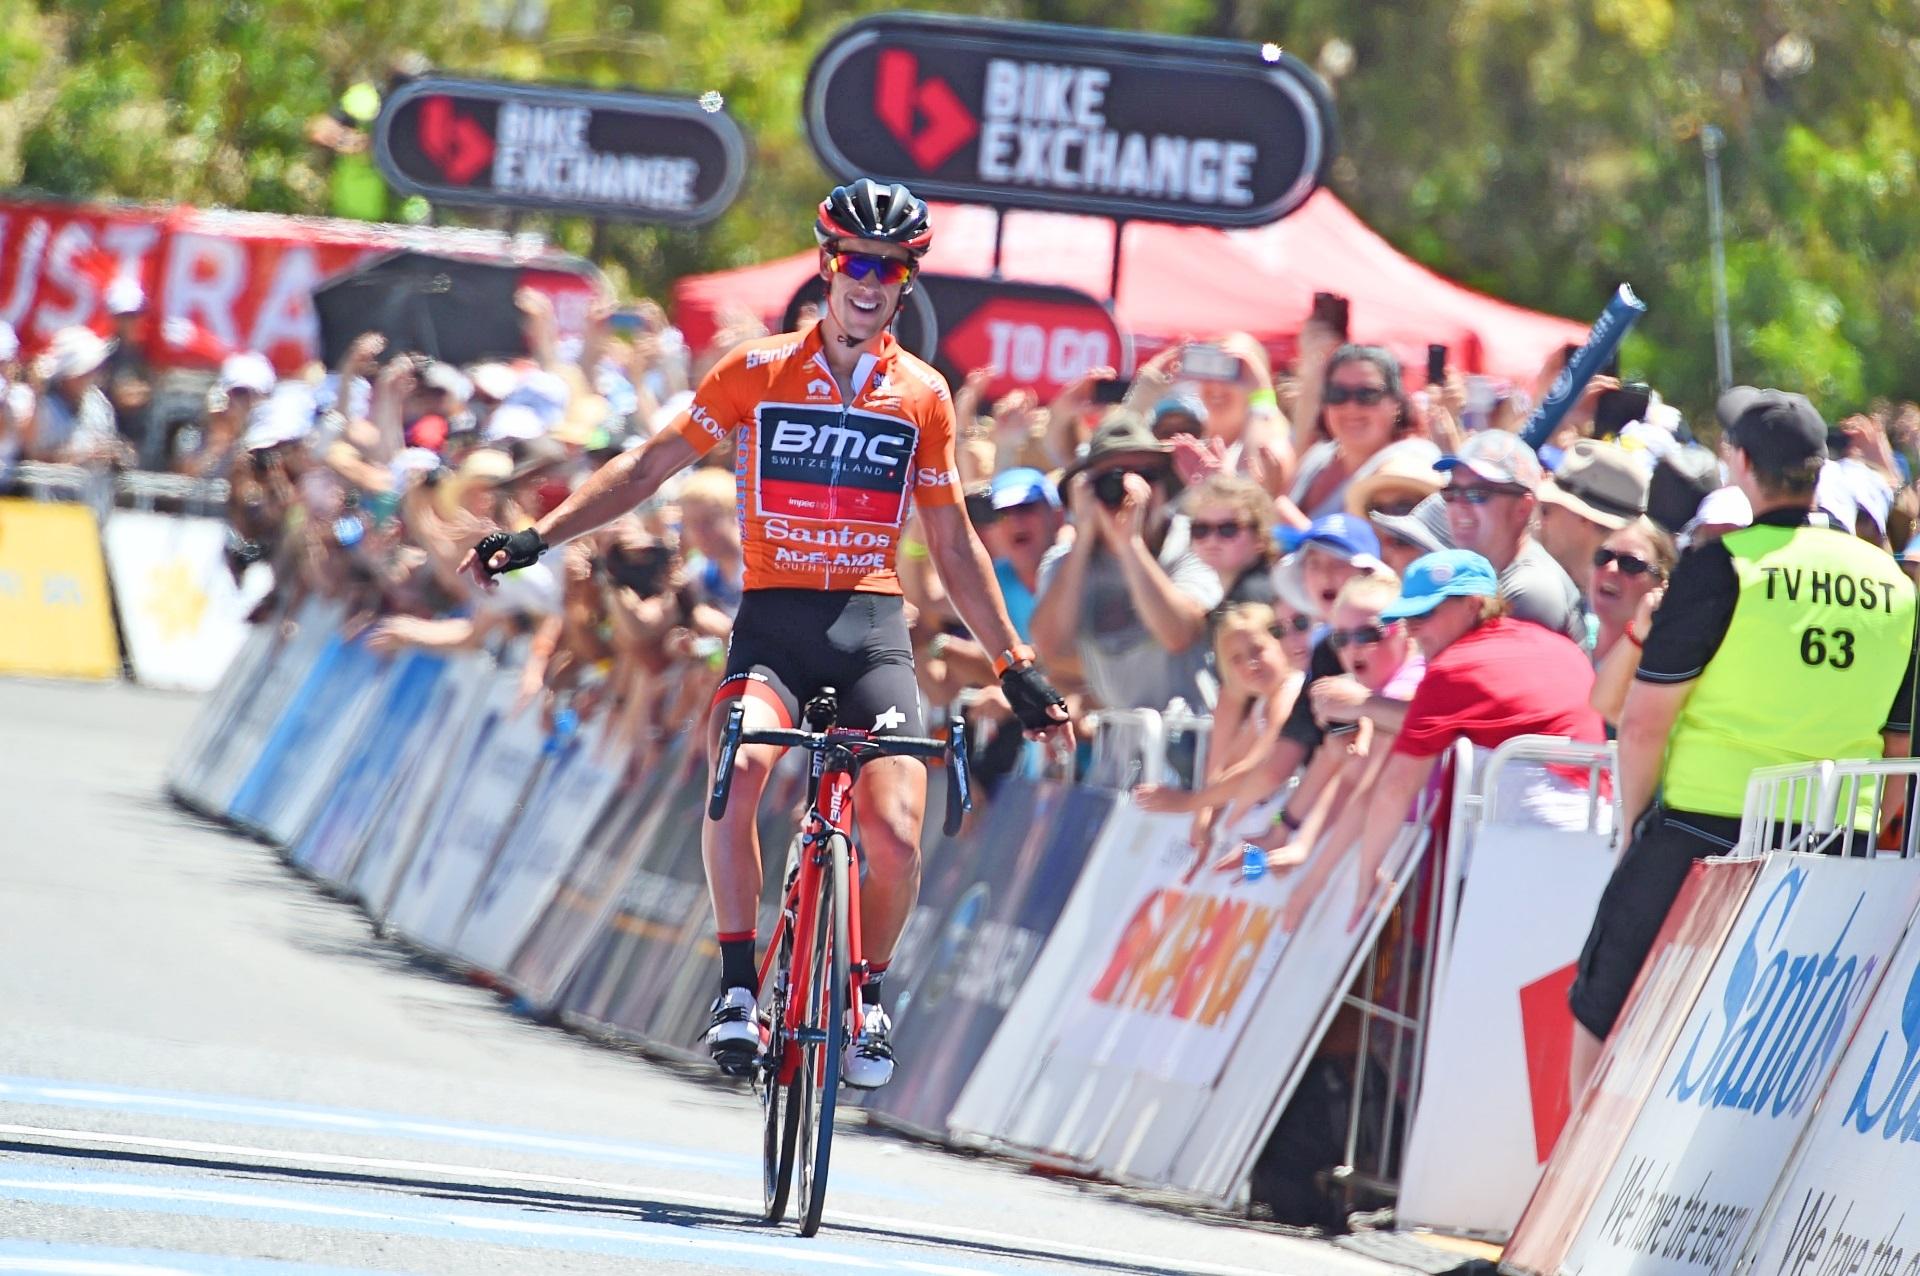 Richie Porte https://roadcyclinguk.com/racing/previews/santos-tour-2017-preview-route-riders.html